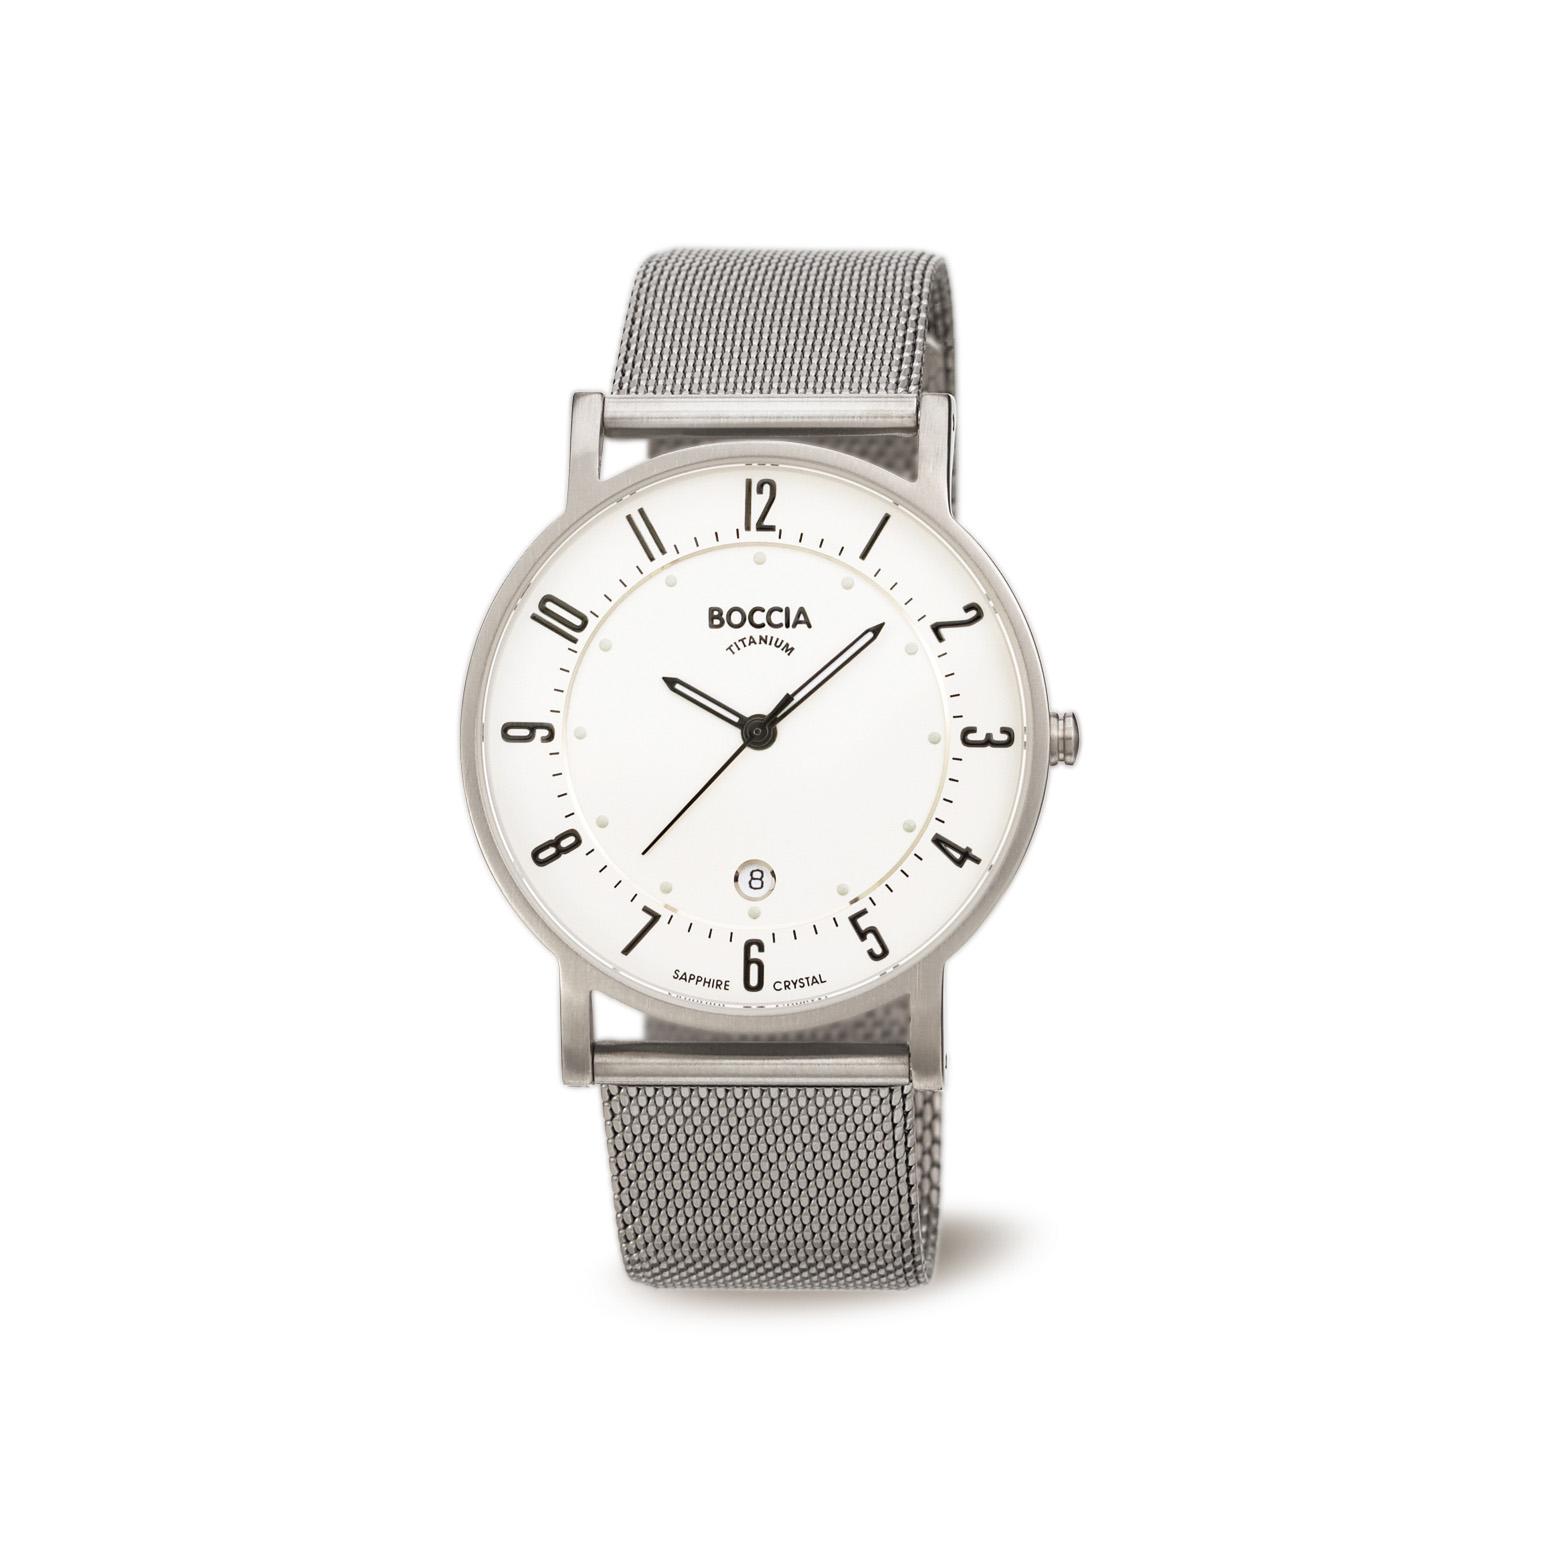 Boccia Titanium 3533.04 horloge Staal Zilverkleurig 37 mm